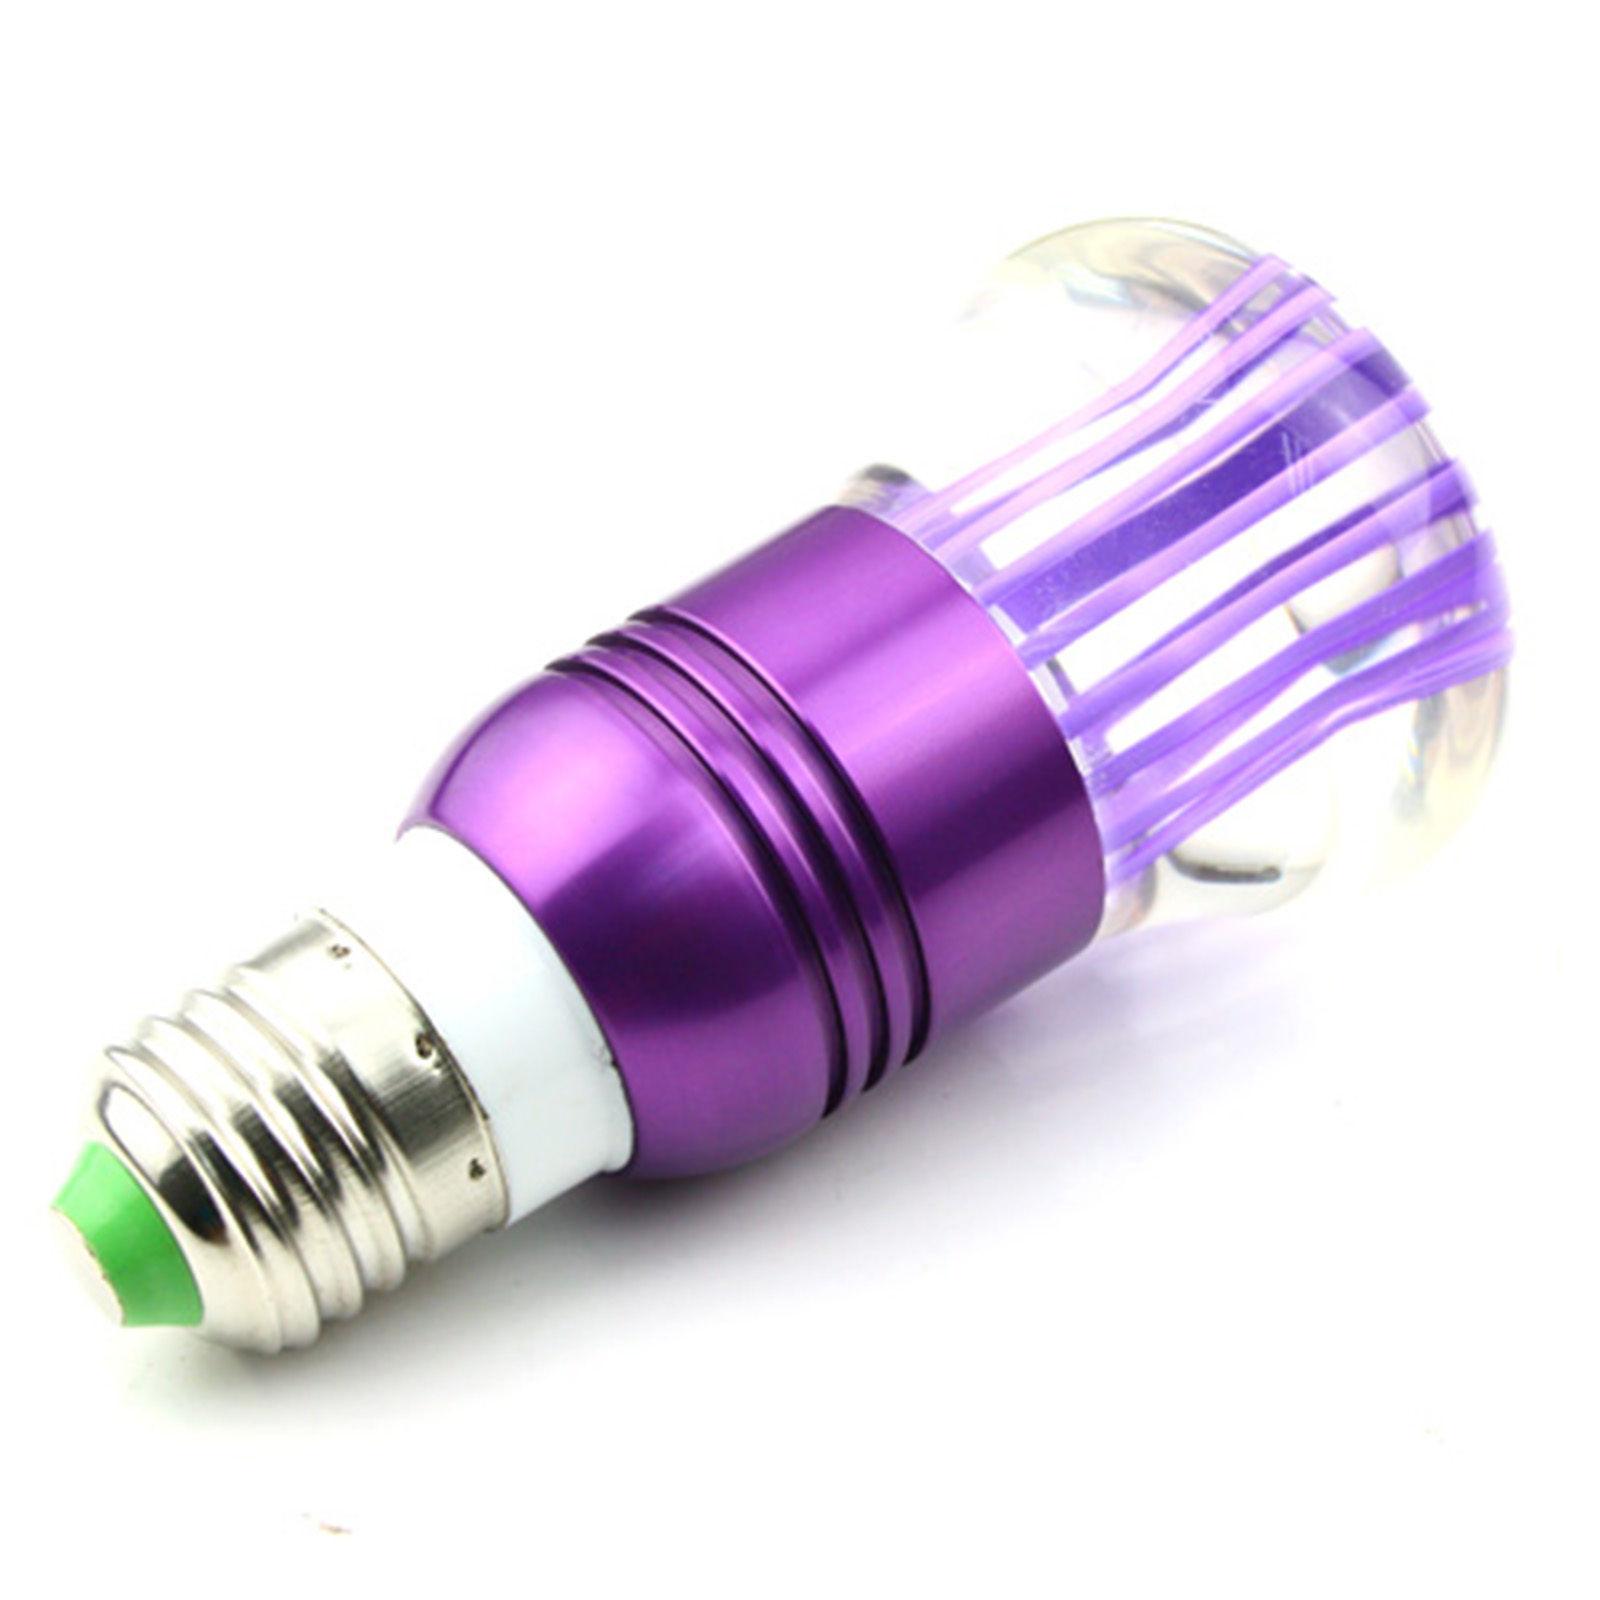 Rgb led lampa E27 3watt 16 xromaton1